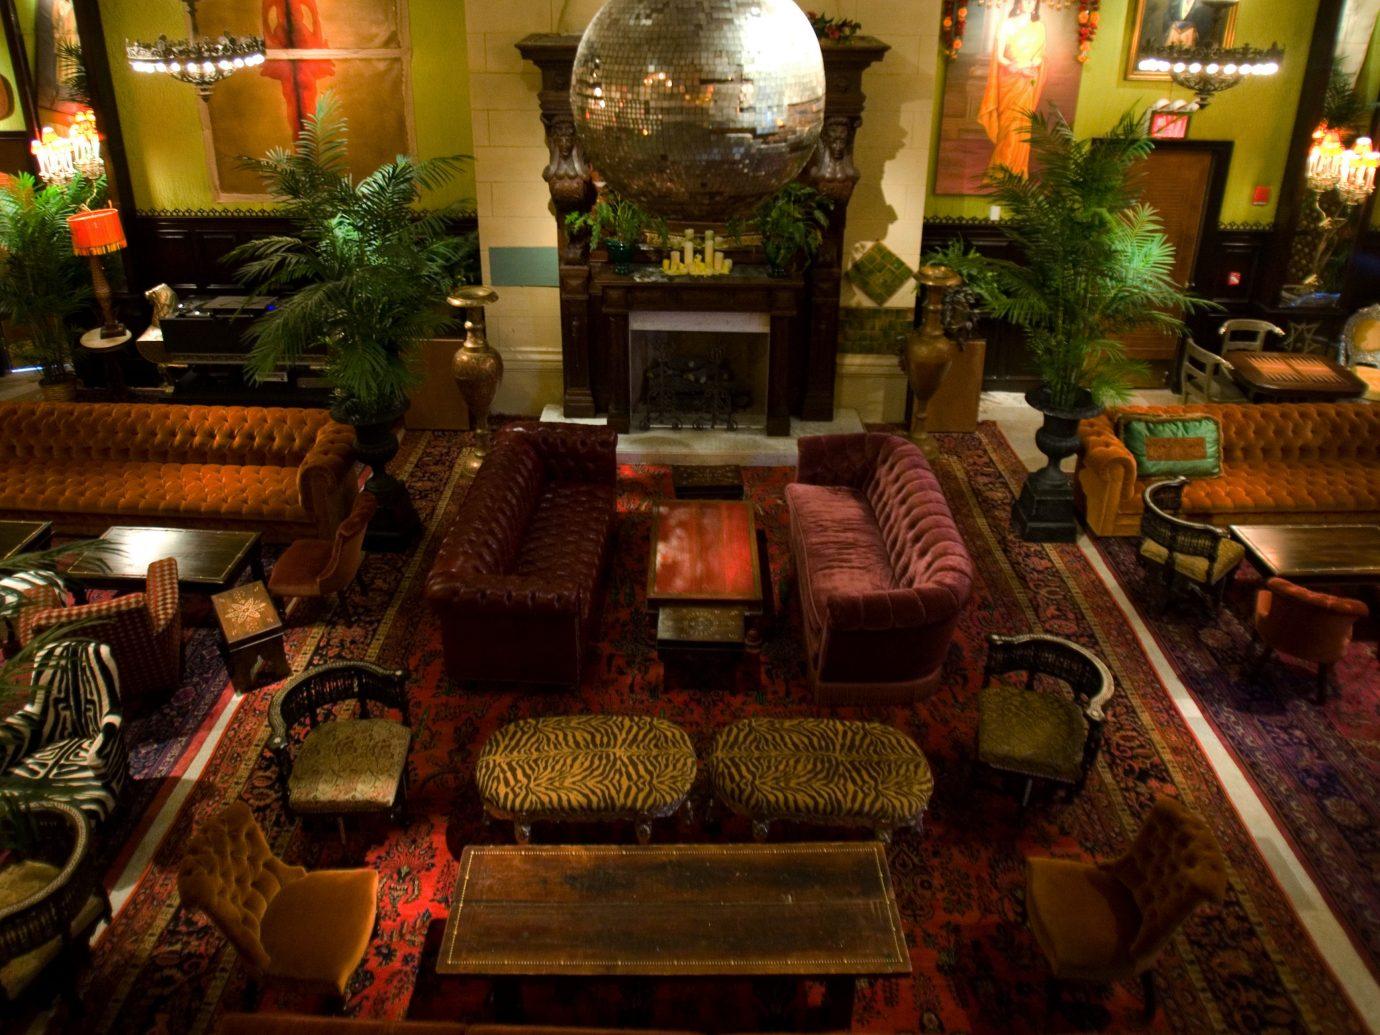 Budget Living Lounge Luxury Modern Trip Ideas indoor restaurant Lobby meal Resort Bar cluttered furniture